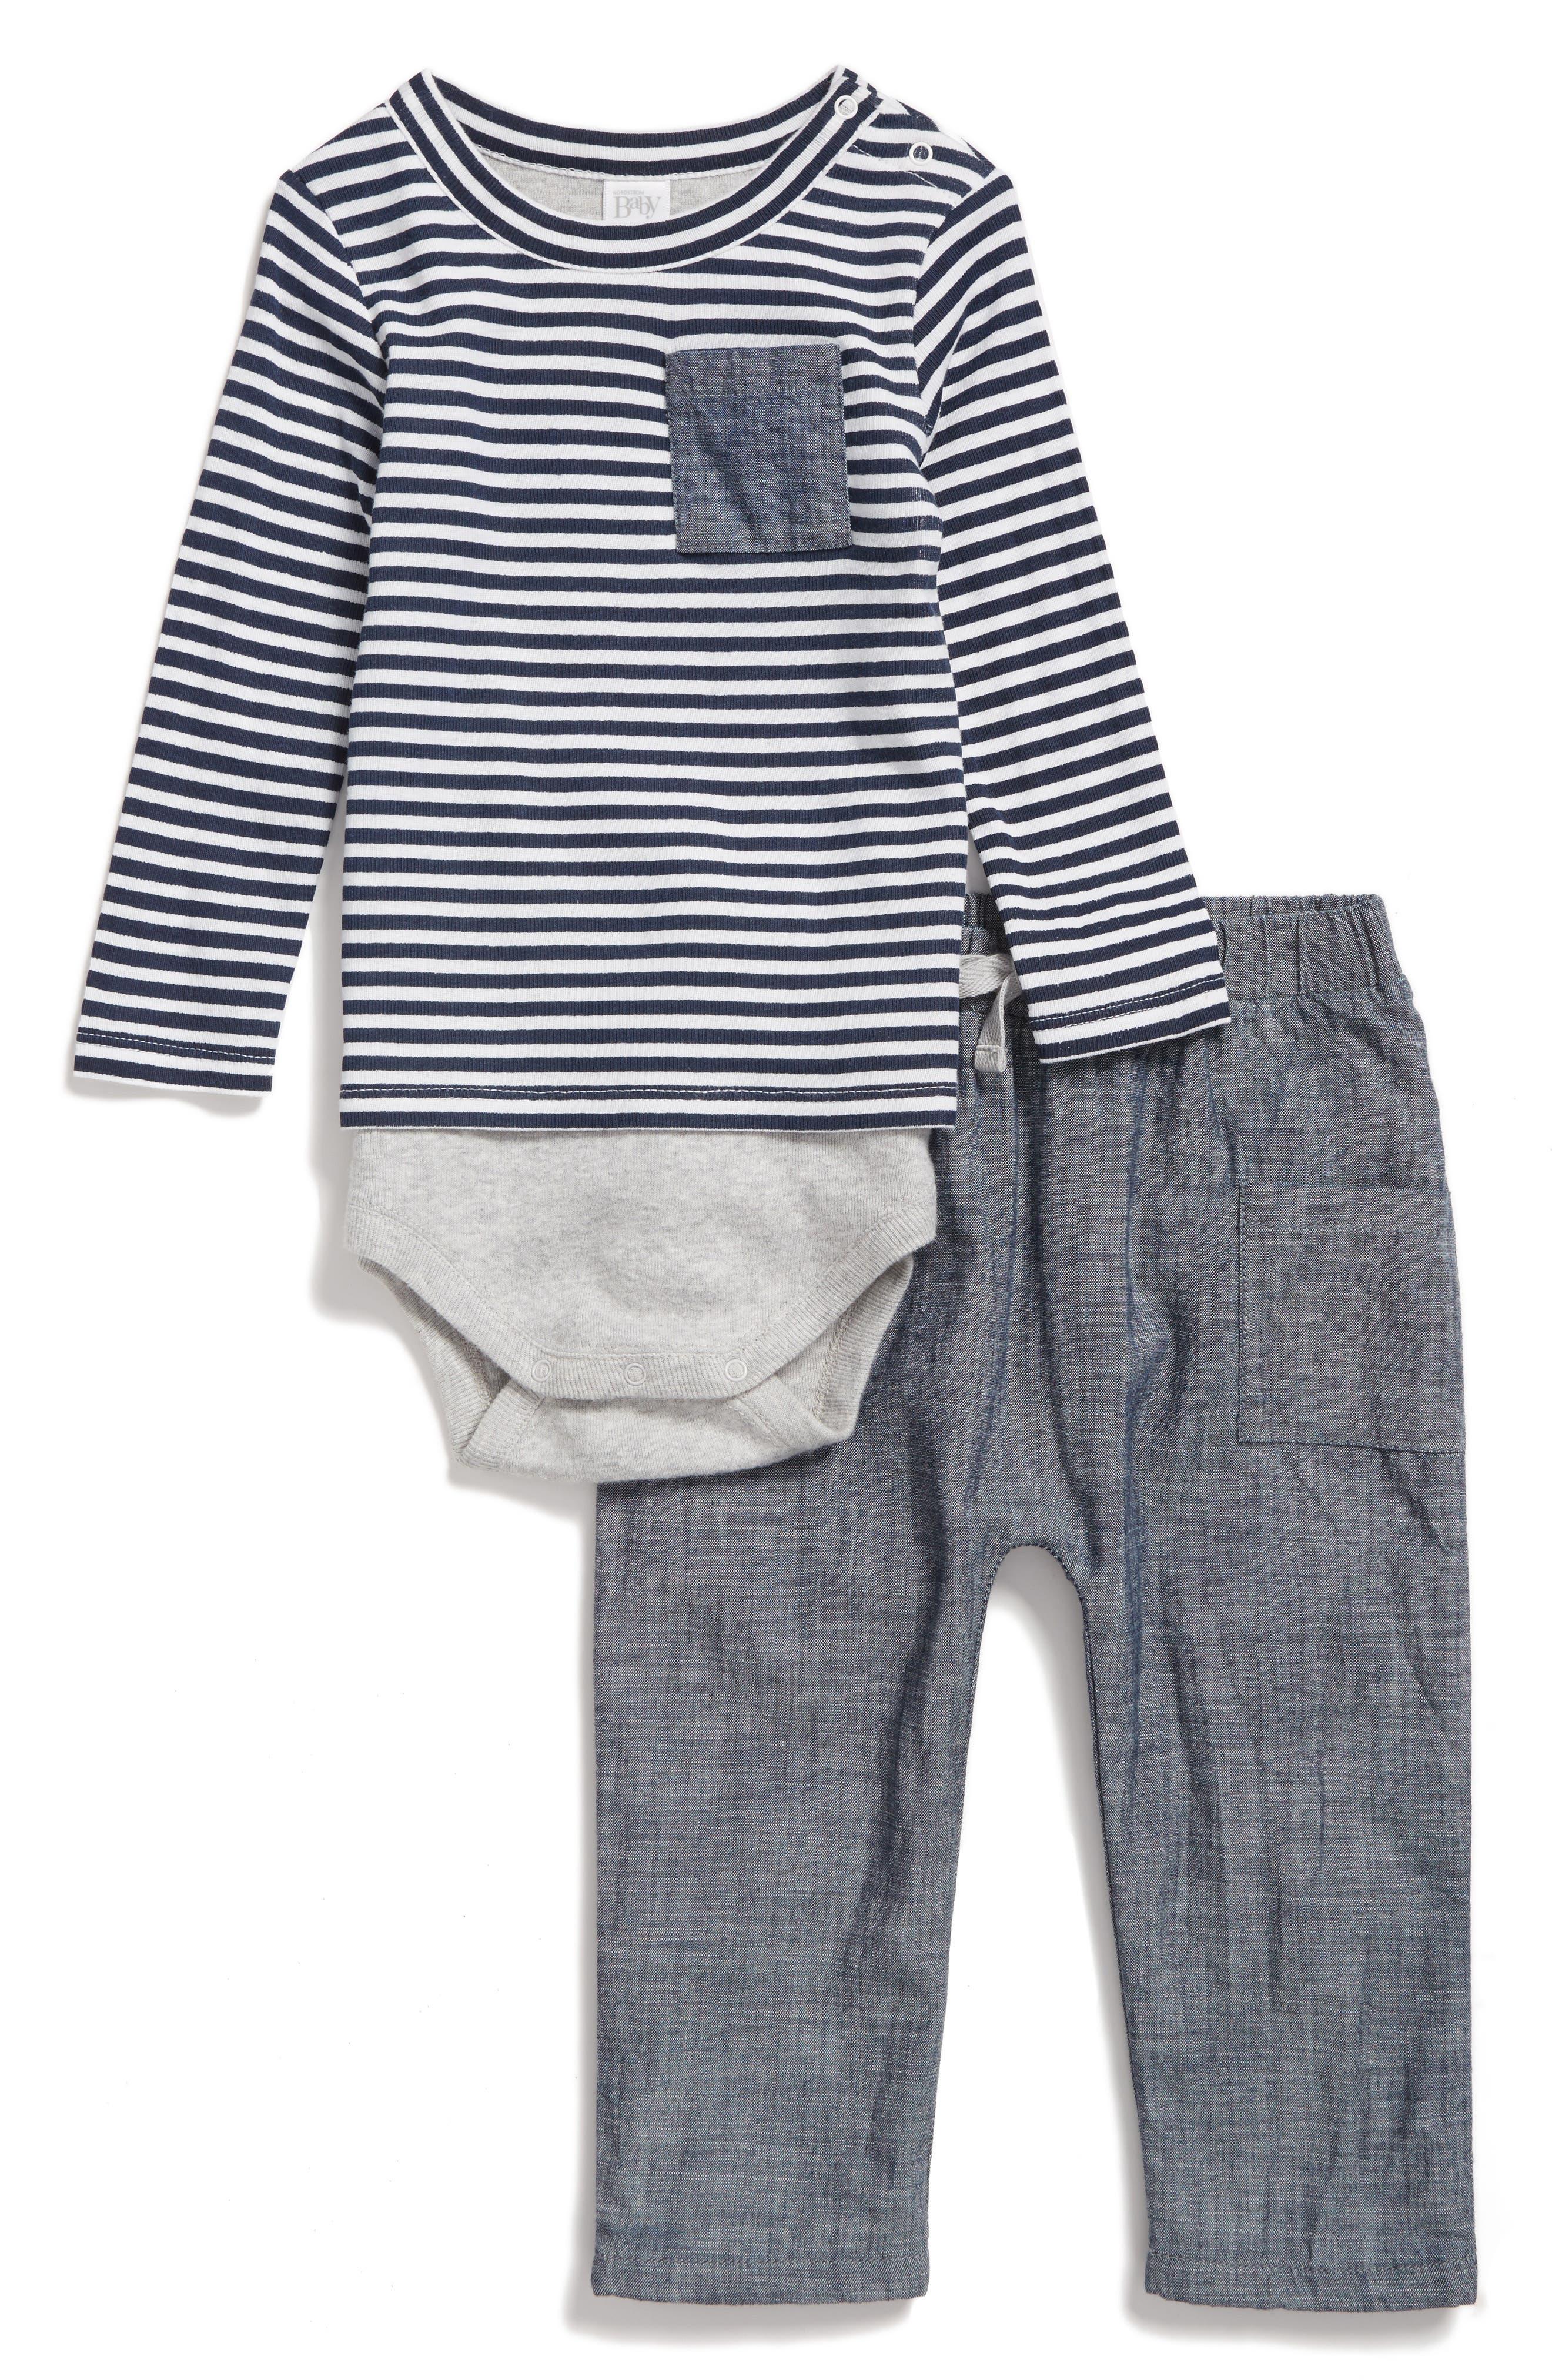 NORDSTROM BABY Bodysuit & Pants Set